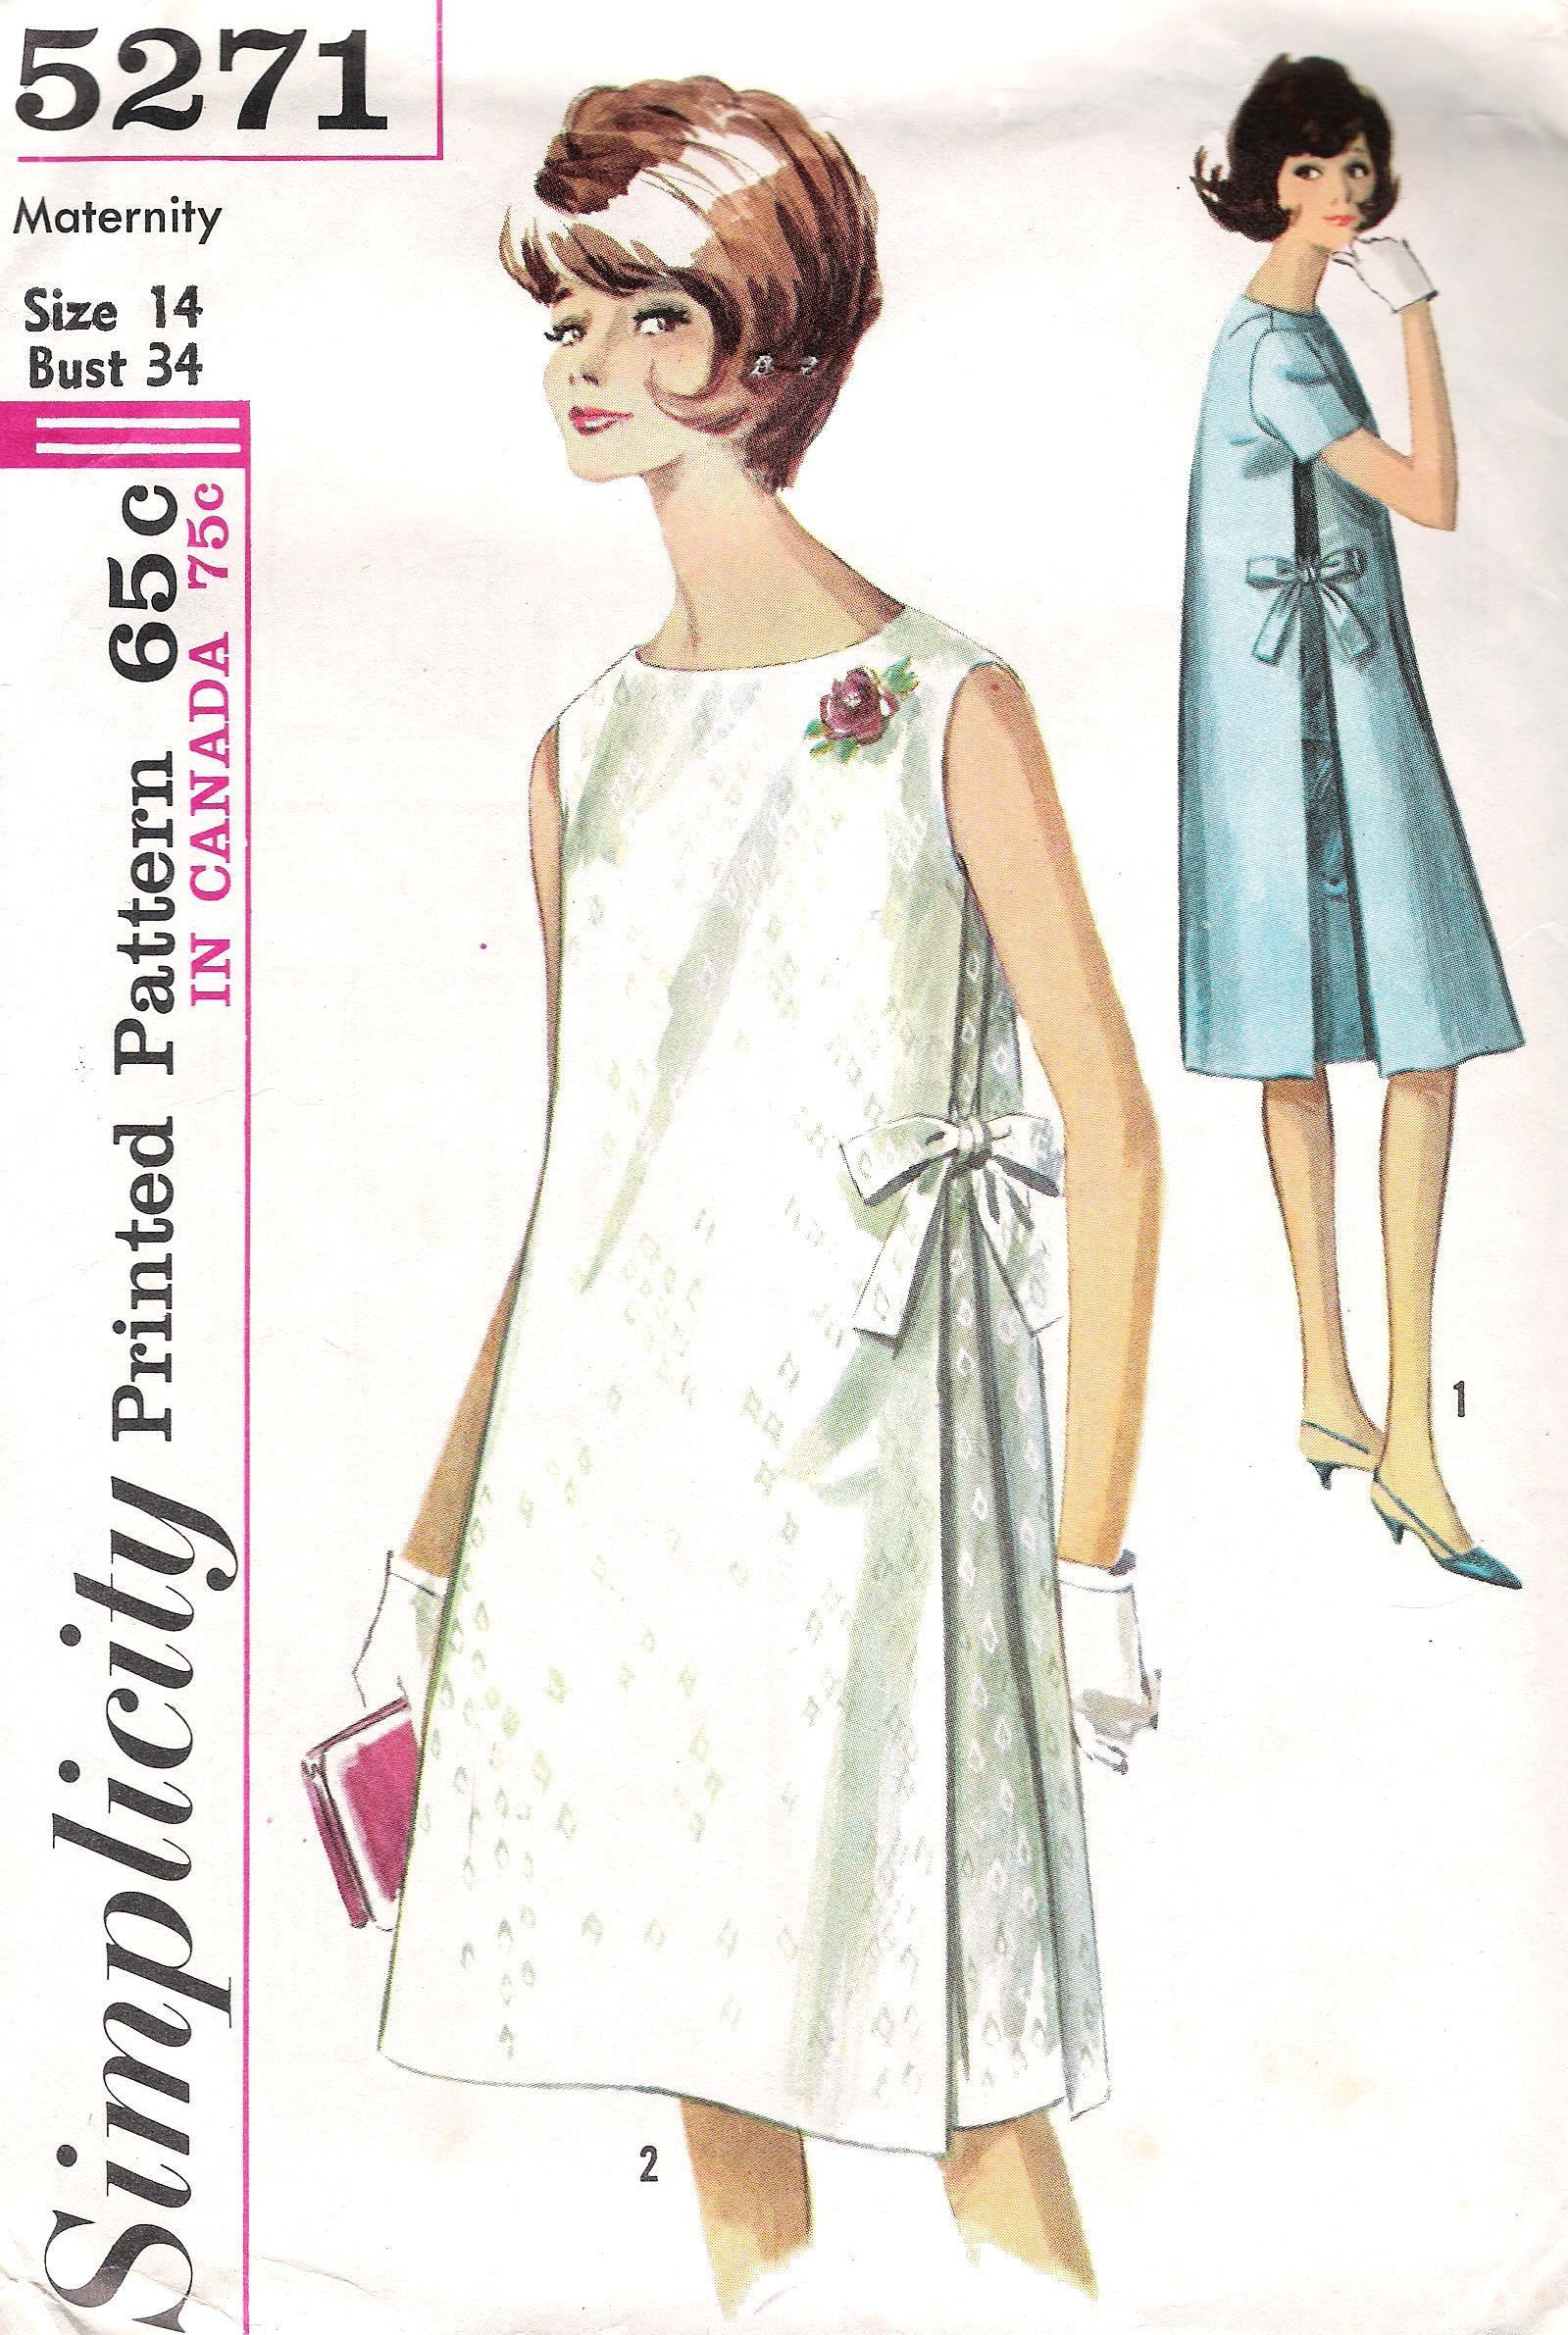 Simplicity 5271 | Moda retro | Pinterest | Moda retro, Costura y Moda